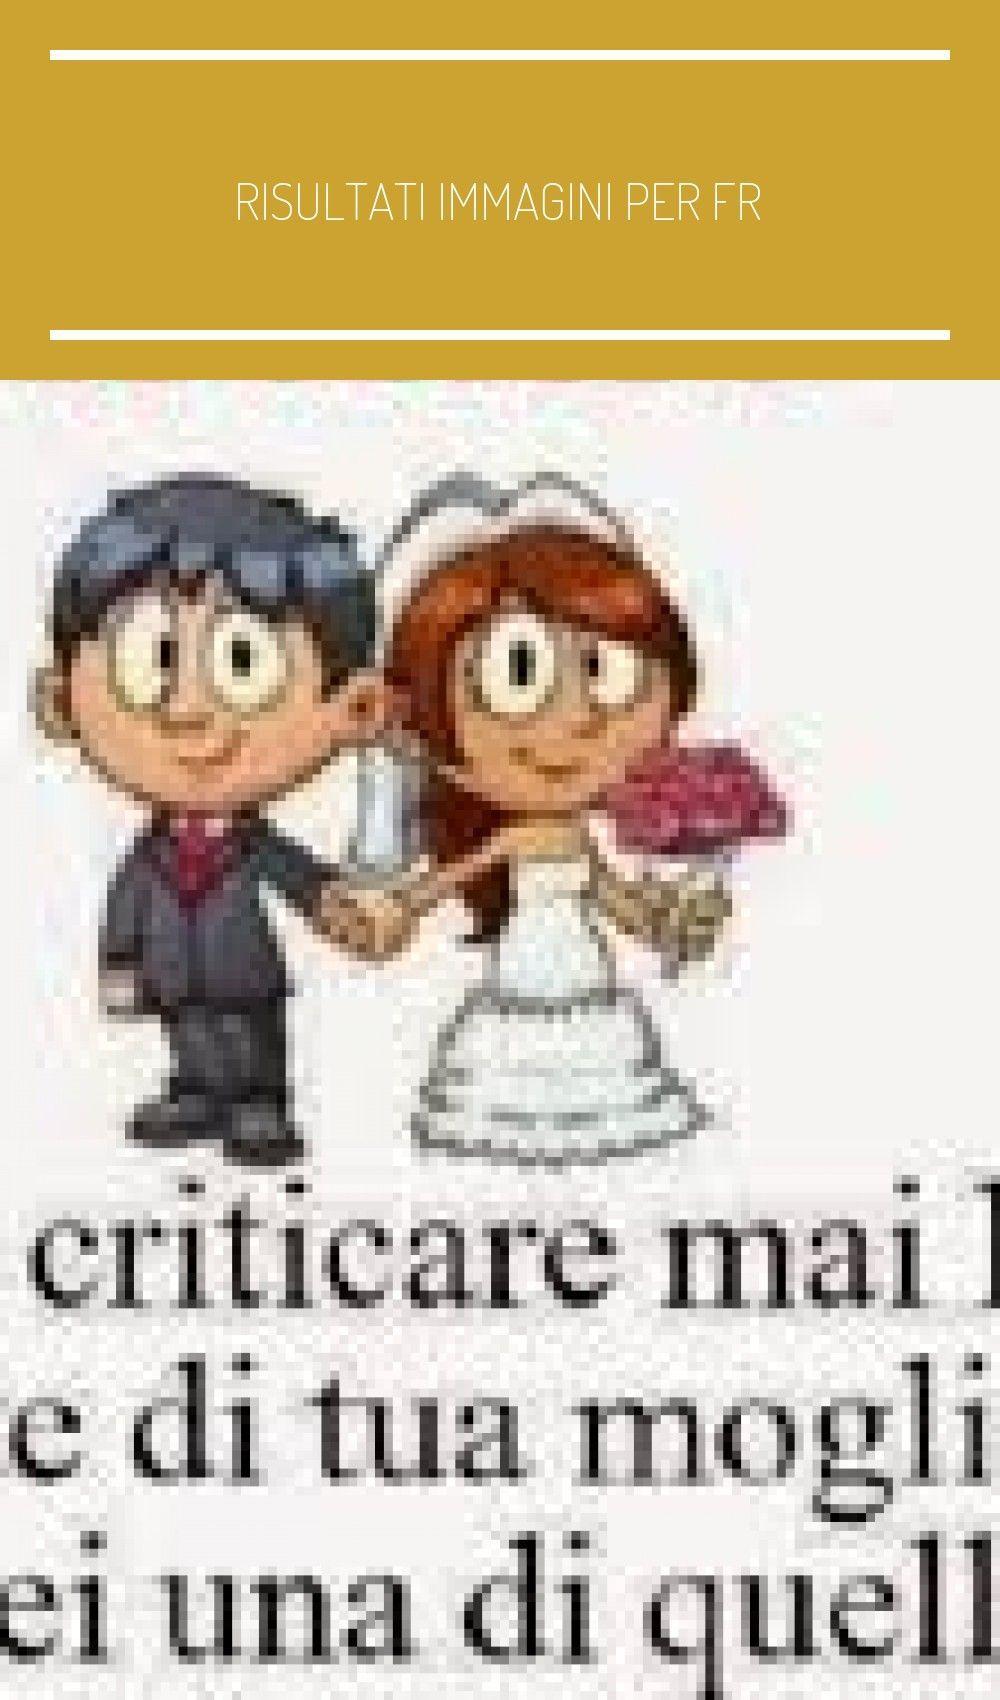 Ergebnisbilder Fur Hochzeitstagssatze Lustige Witze Risultati Immagini Per Frasi Anniversario Matrimonio Divertenti Battute Di In 2020 Lustige Witze Witze Lustig